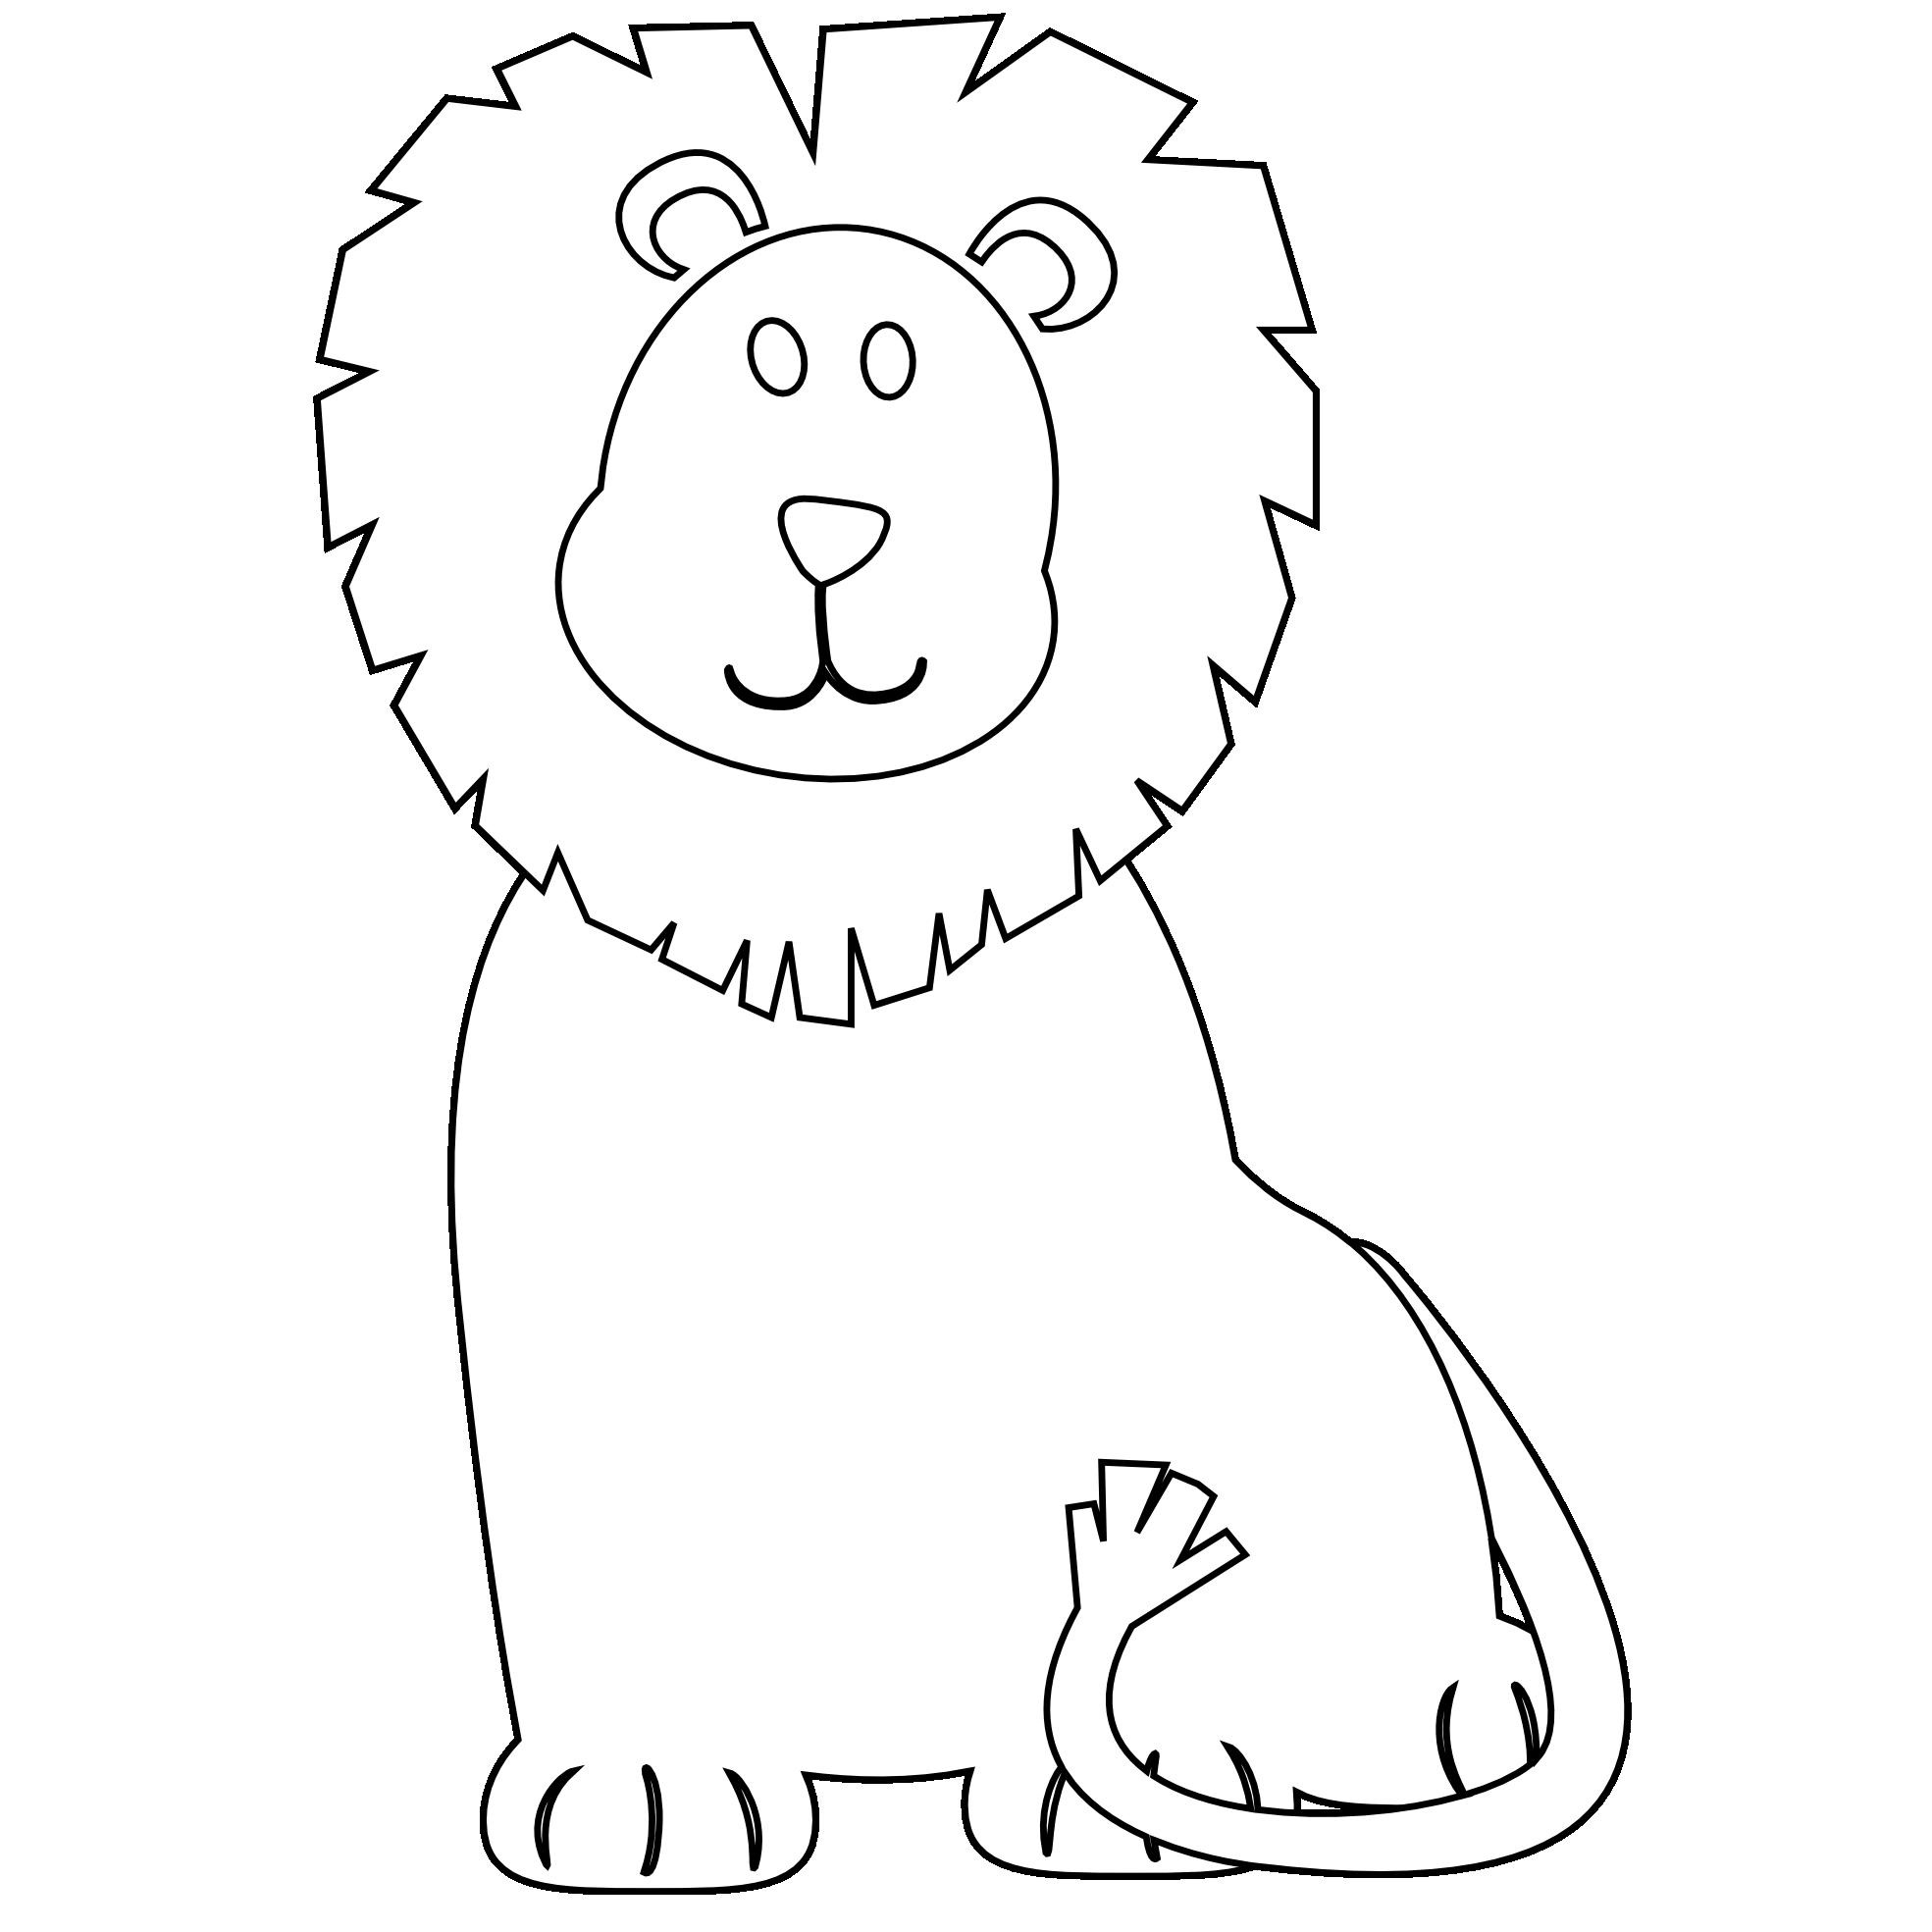 Antarctica book clipart black and white image library download Lion Clipart Black And White | Clipart Panda - Free Clipart Images image library download